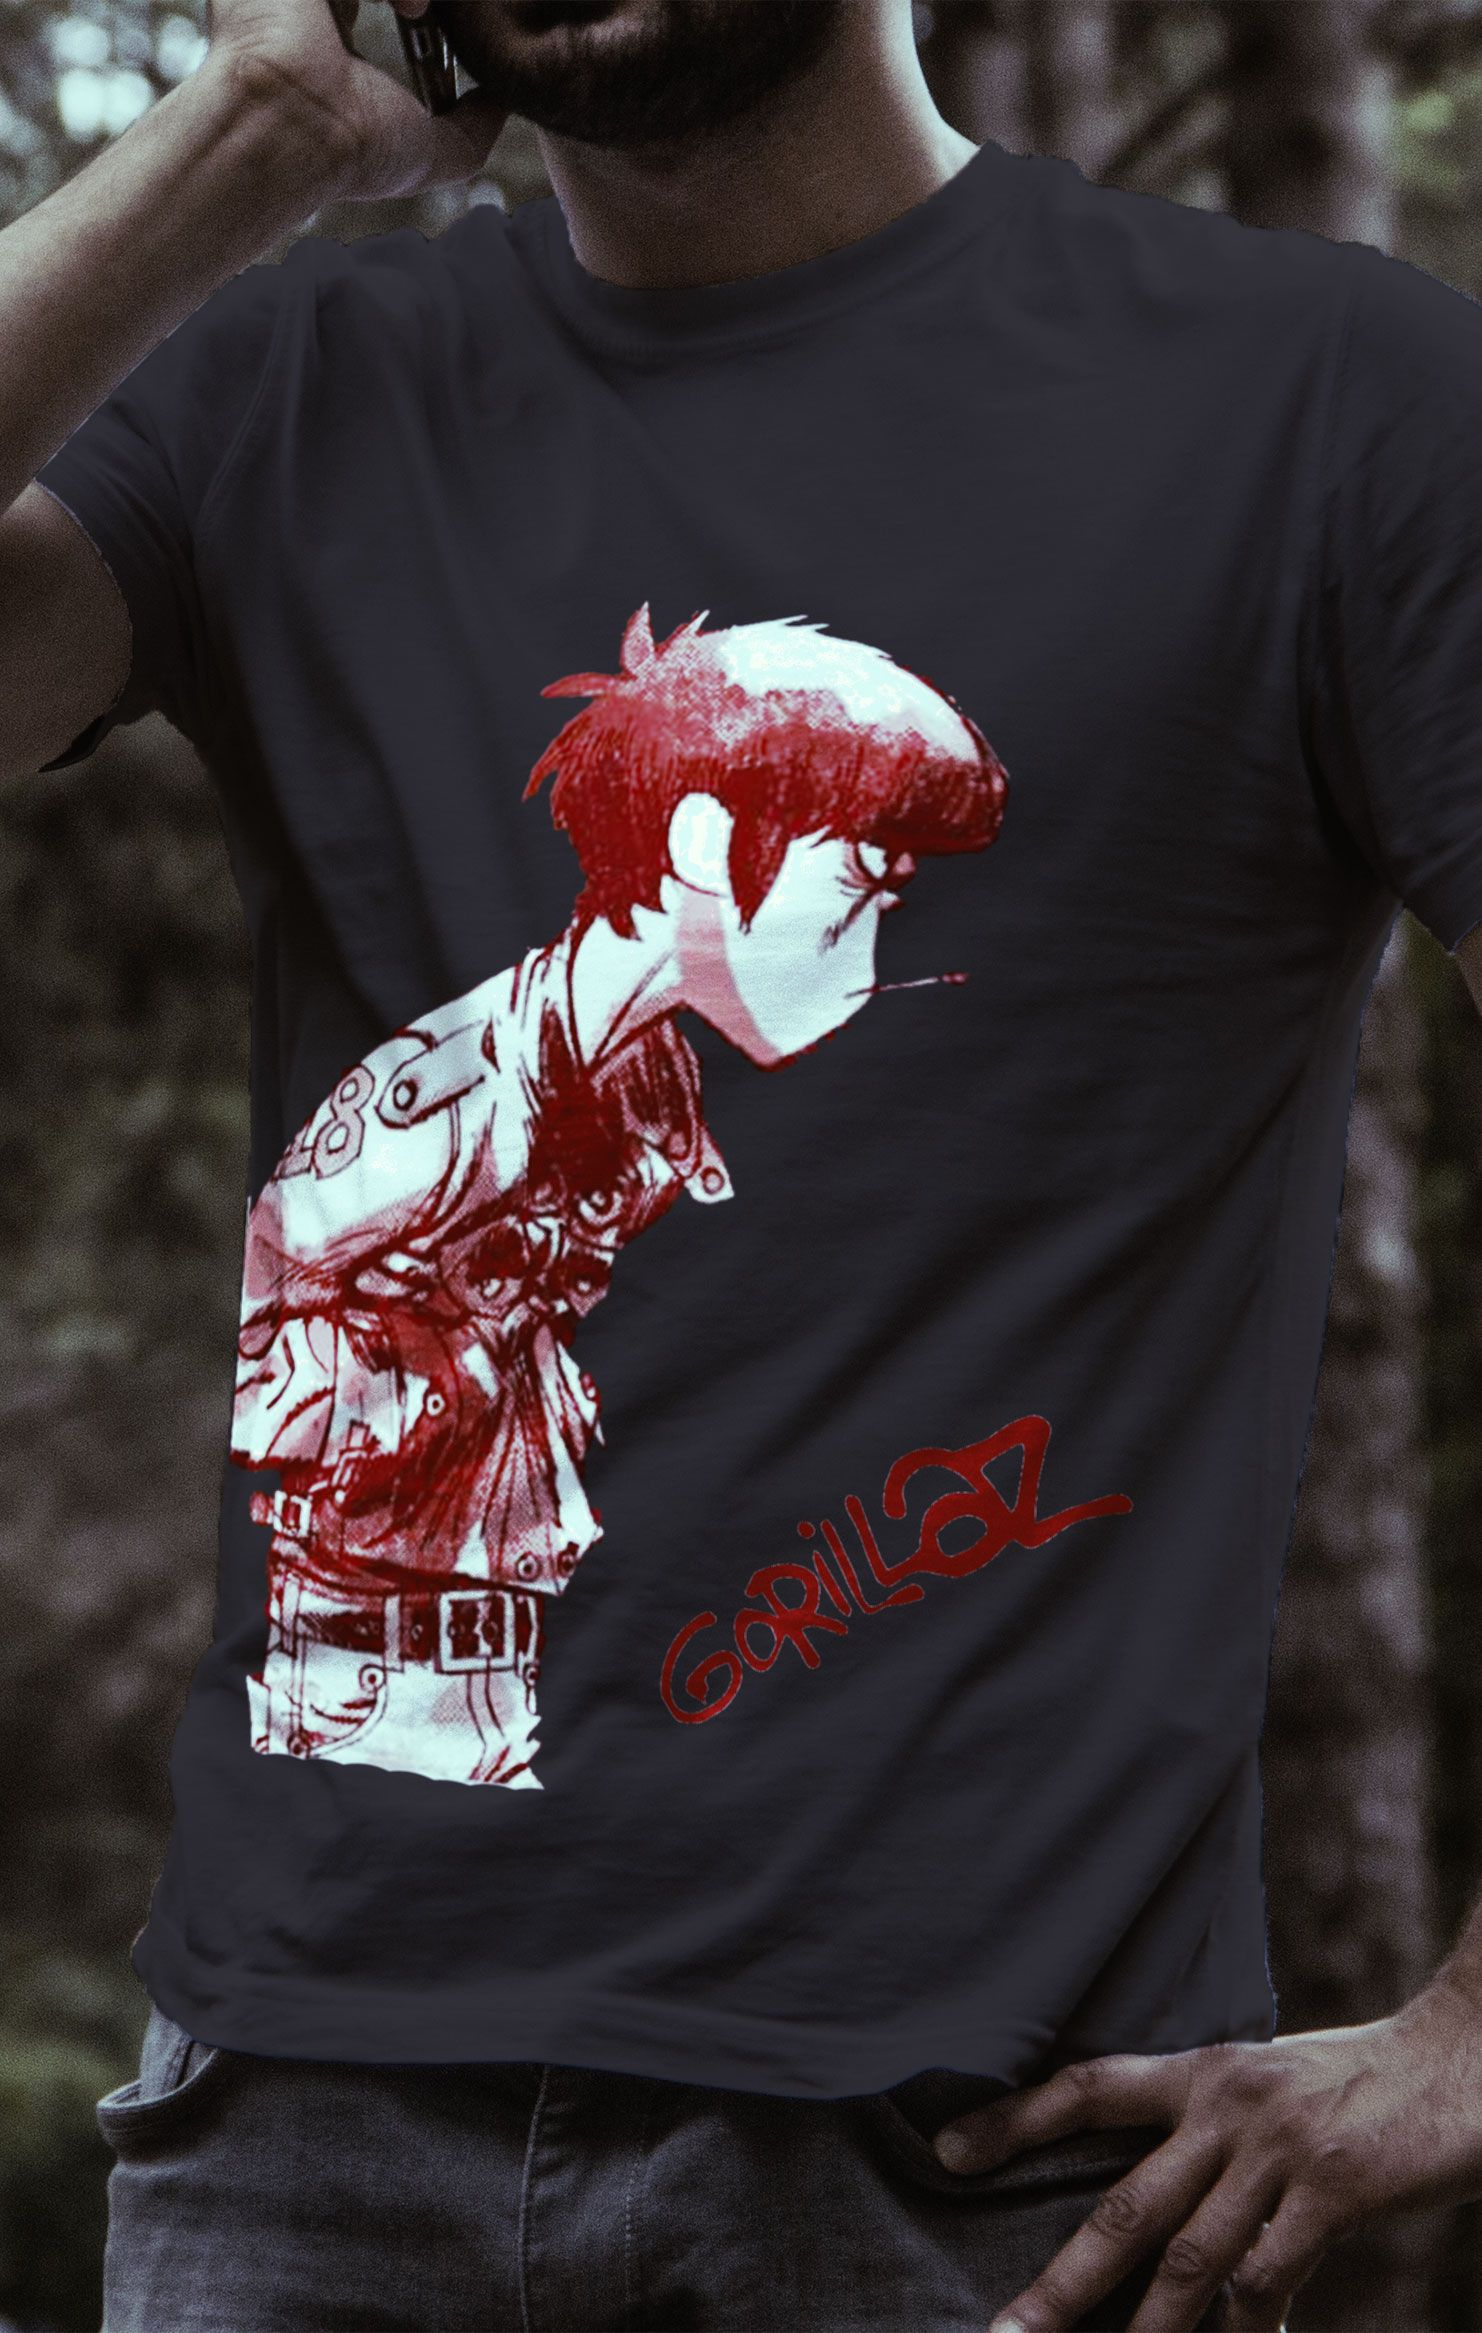 4faac50c Gorillaz Black Murdoc T-Shirt | Things to wear | Shirts, Band ...